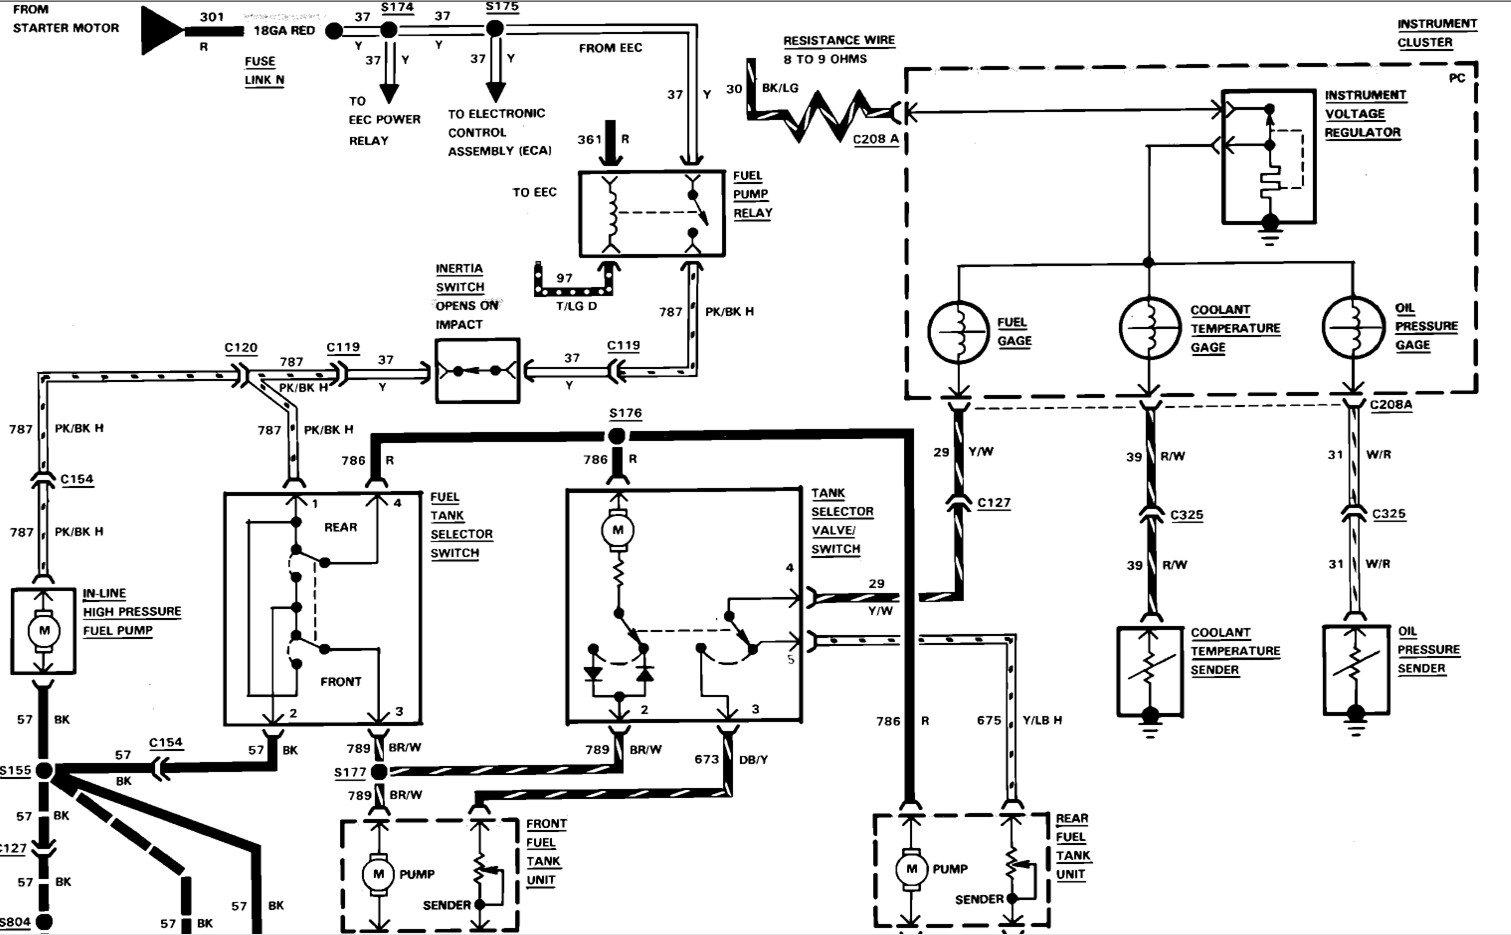 Fabulous 87 Ford F 150 Fuel Pump Wiring Diagram Wiring Diagram Wiring Cloud Ittabisraaidewilluminateatxorg